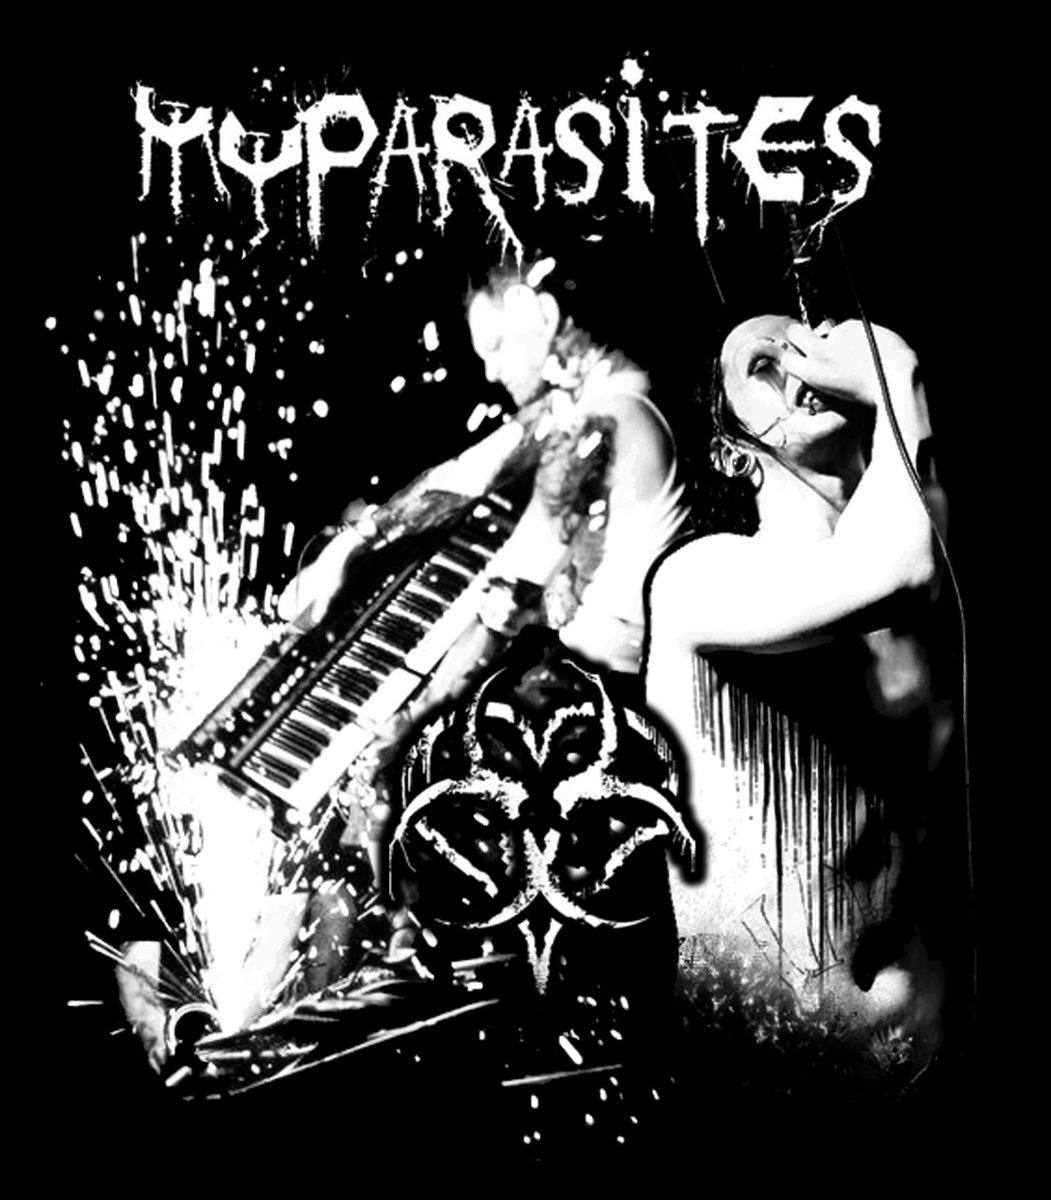 myparasites band